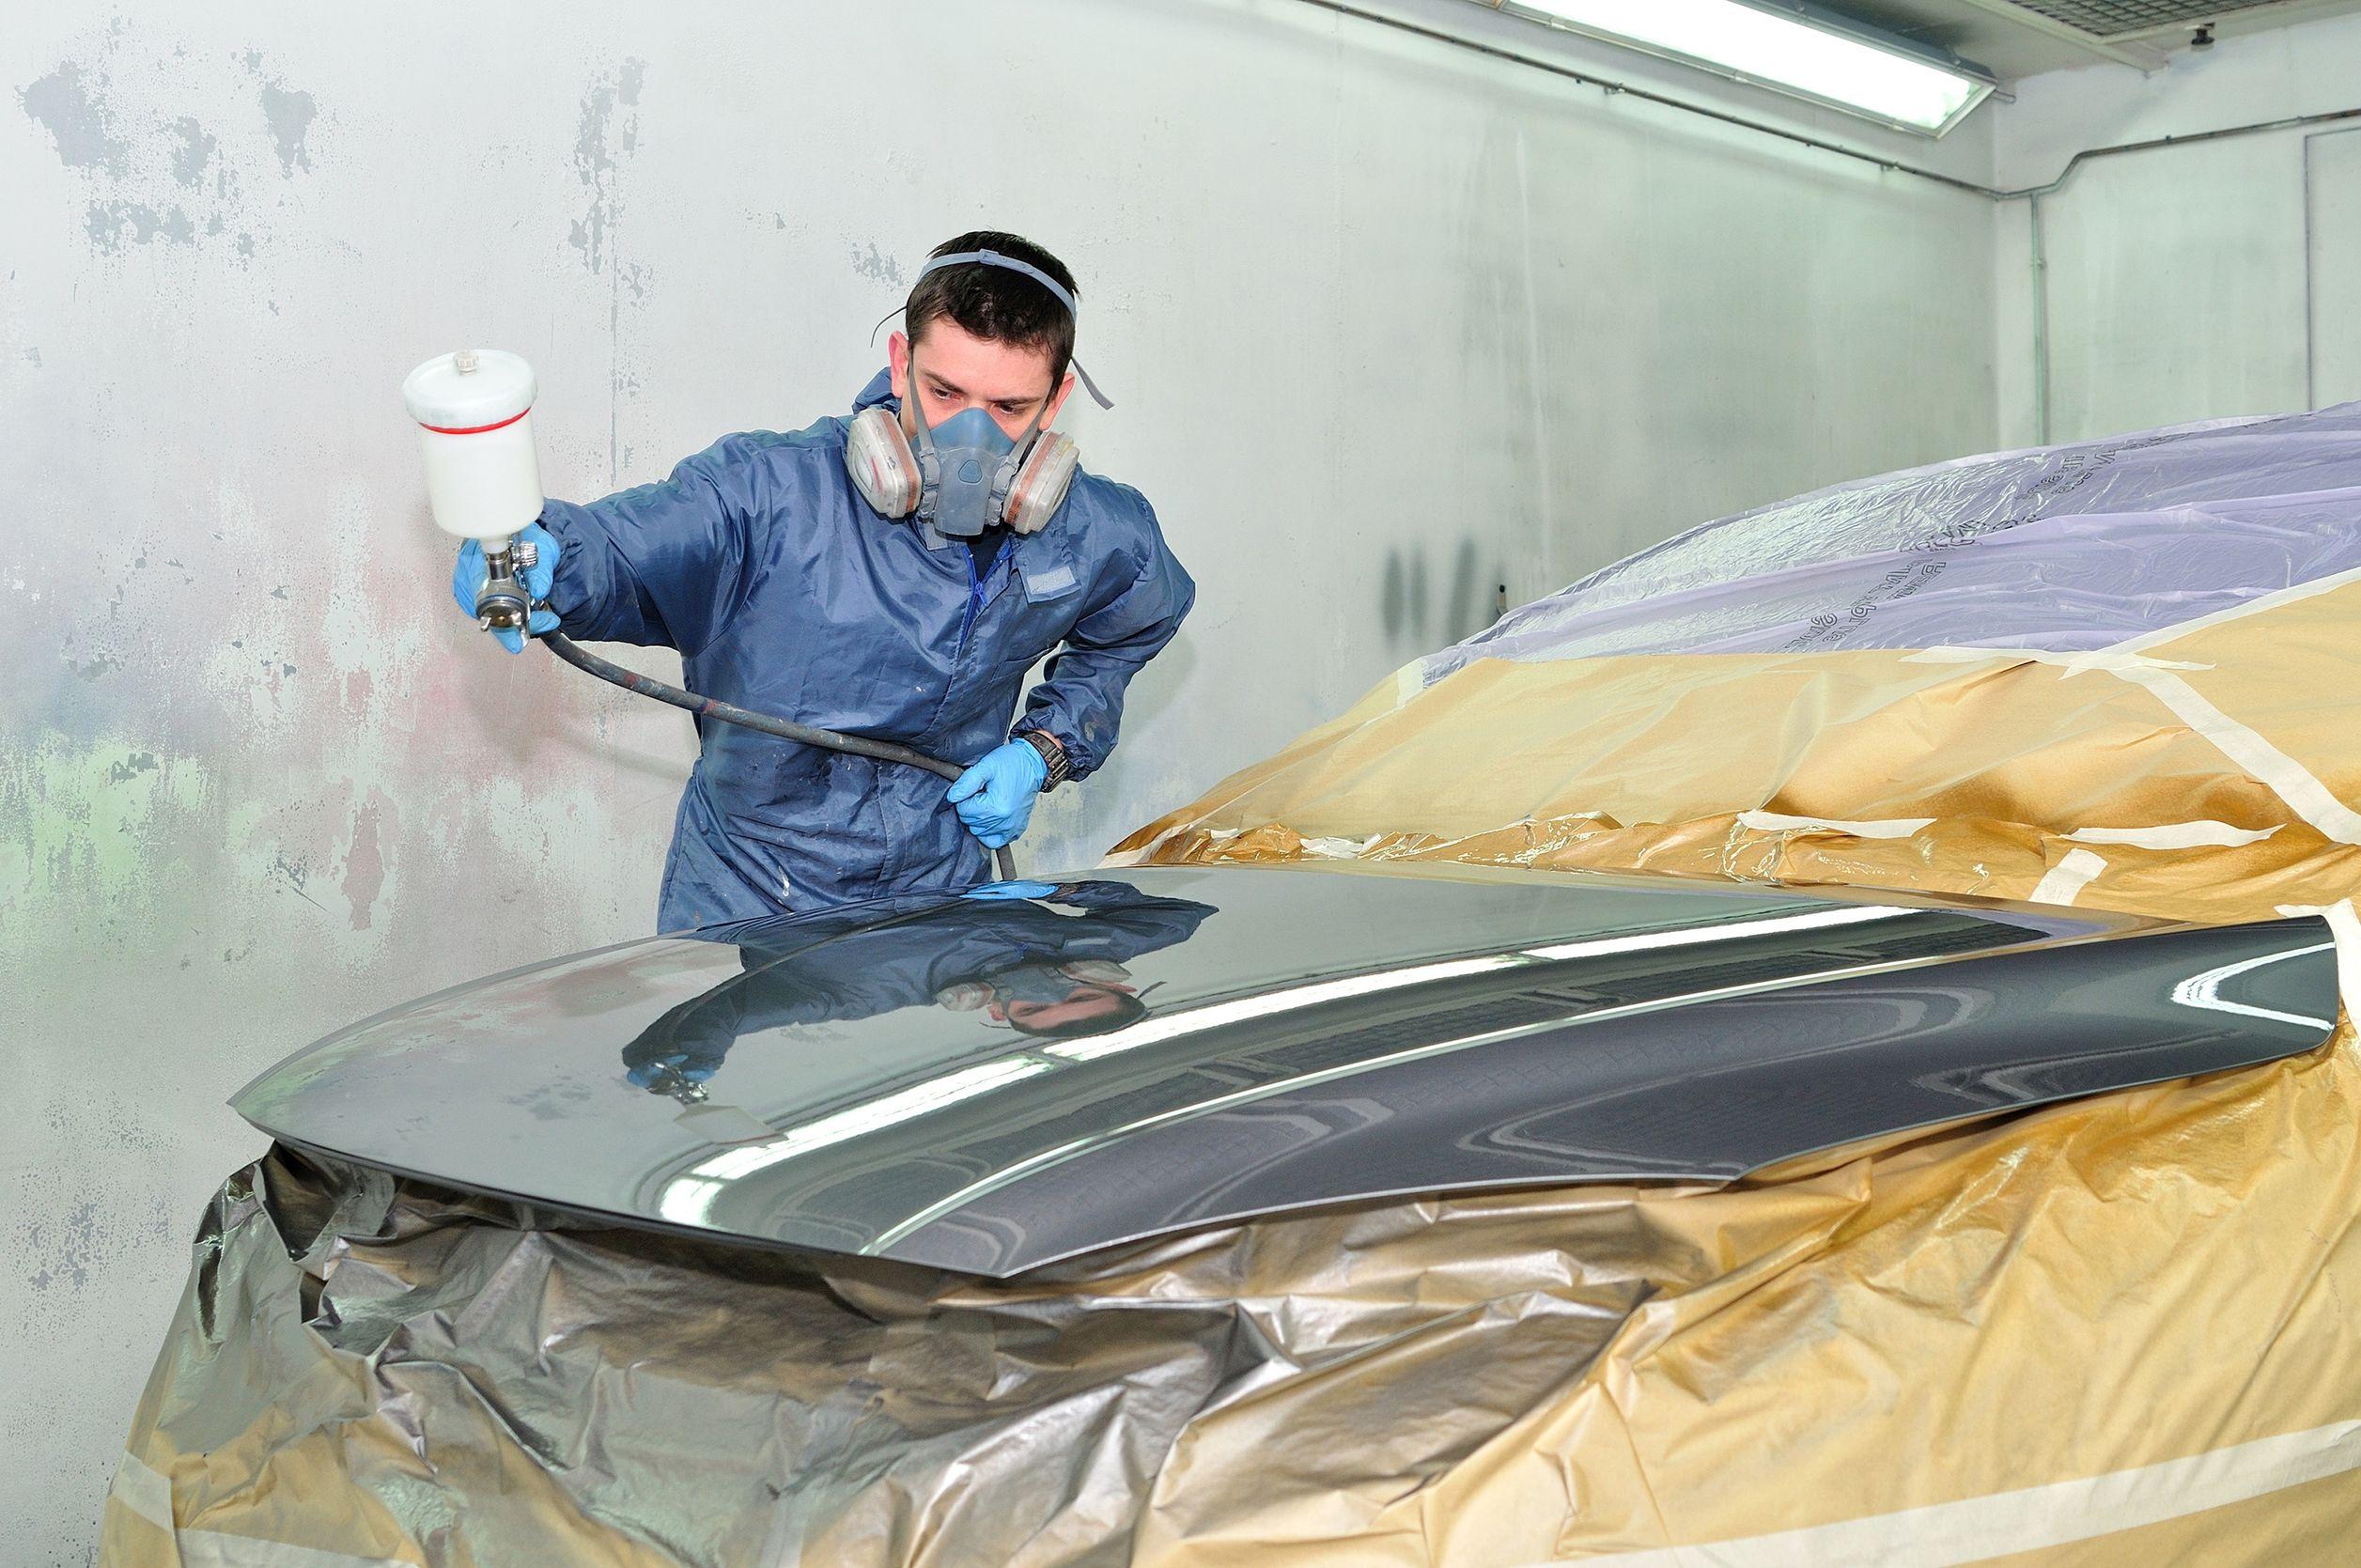 City Mitsubishi Auto Body Jacksonville Florida Collision Repair